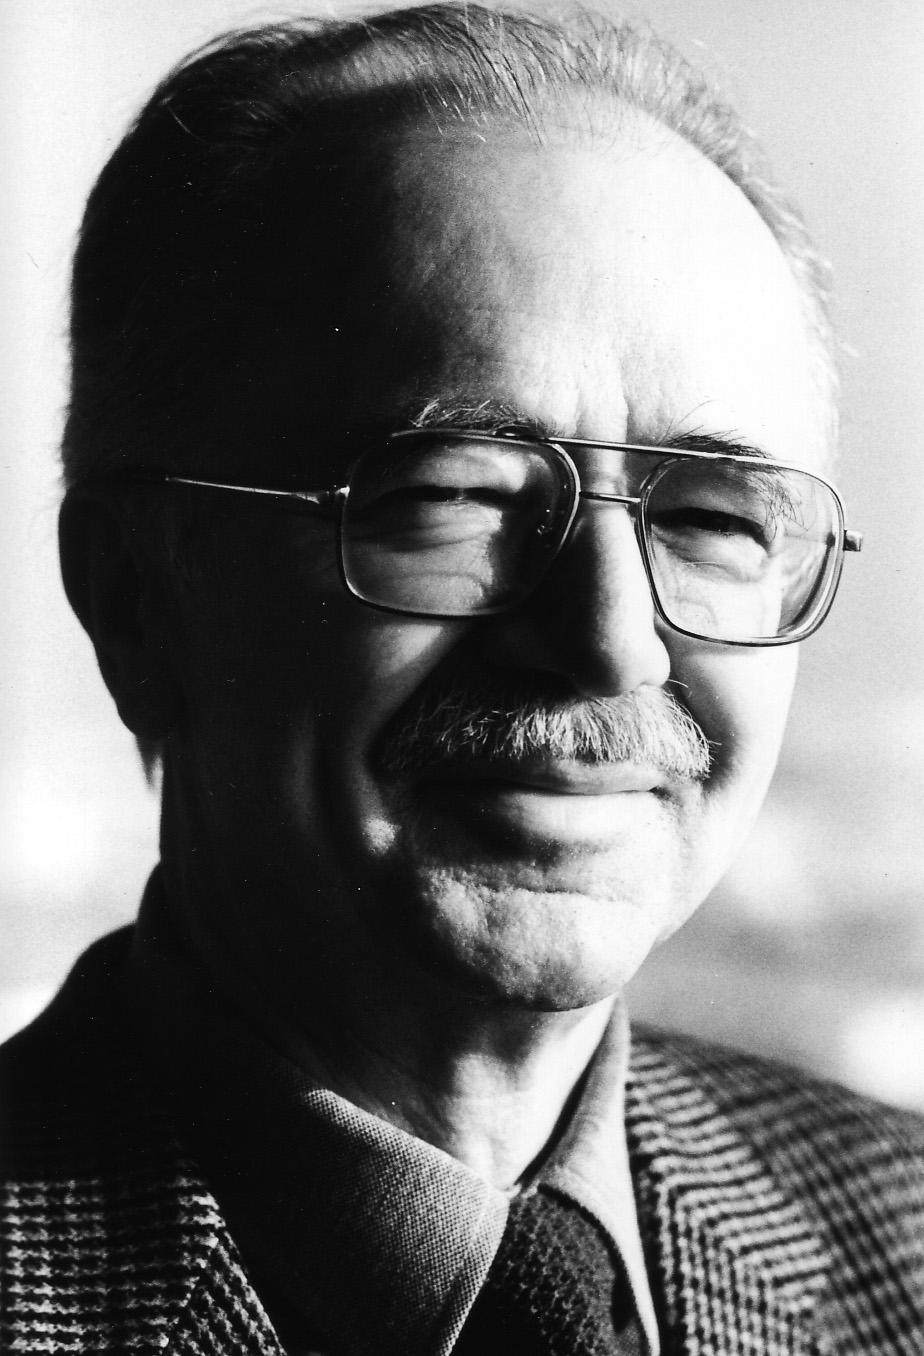 Rolf W. Schirm